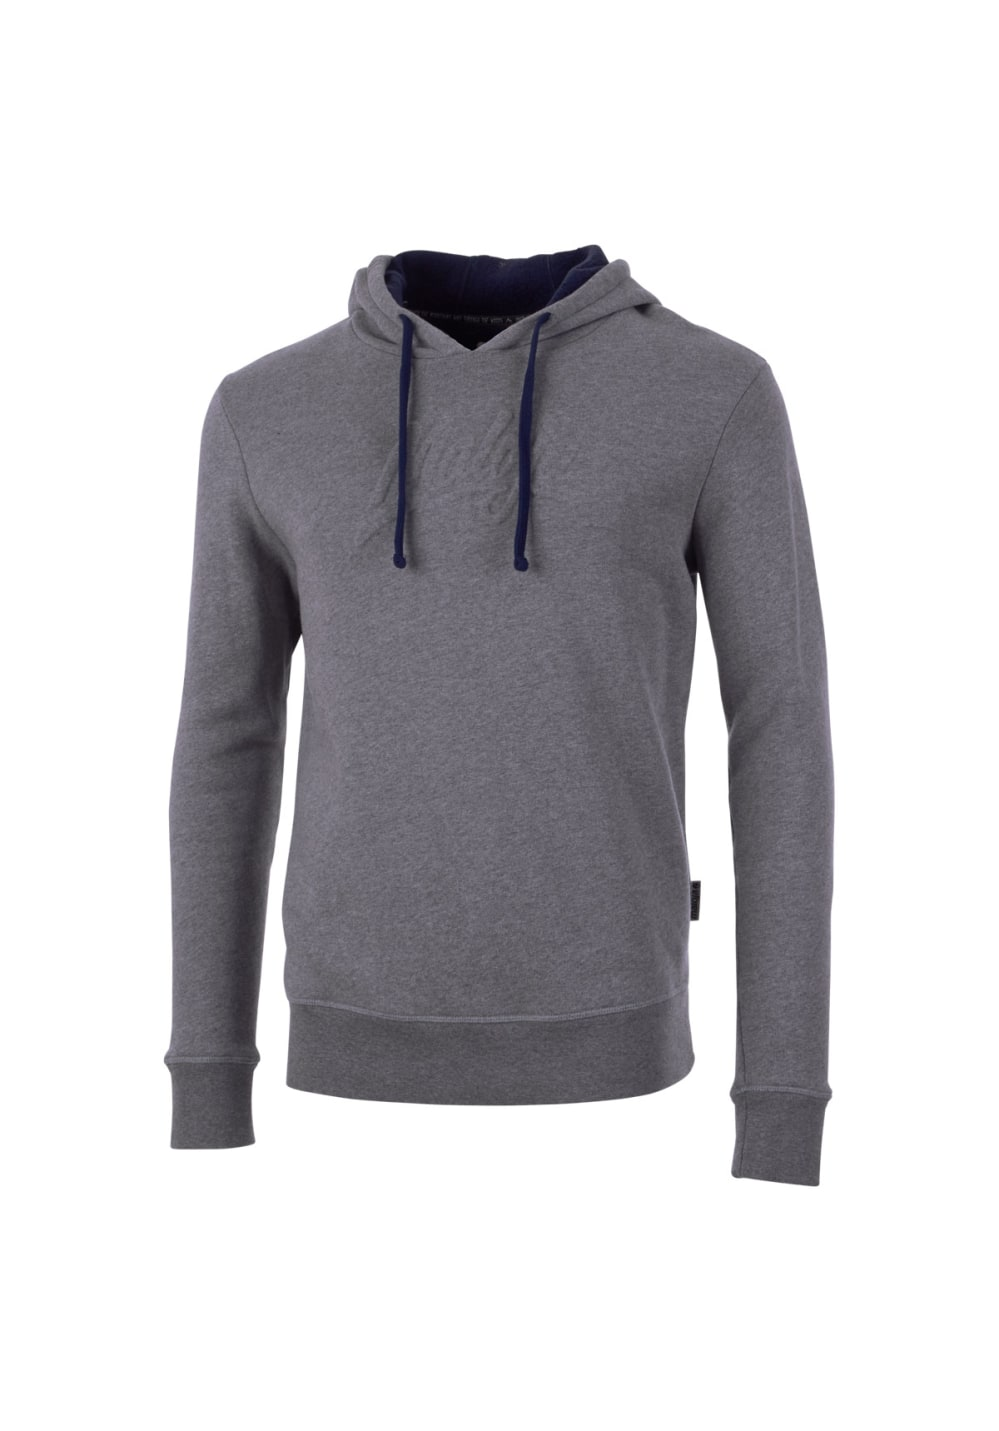 Maloja ClatsopM. Sweat Hoody - Sweatshirts & Hoodies für Herren - Grau, Gr. S